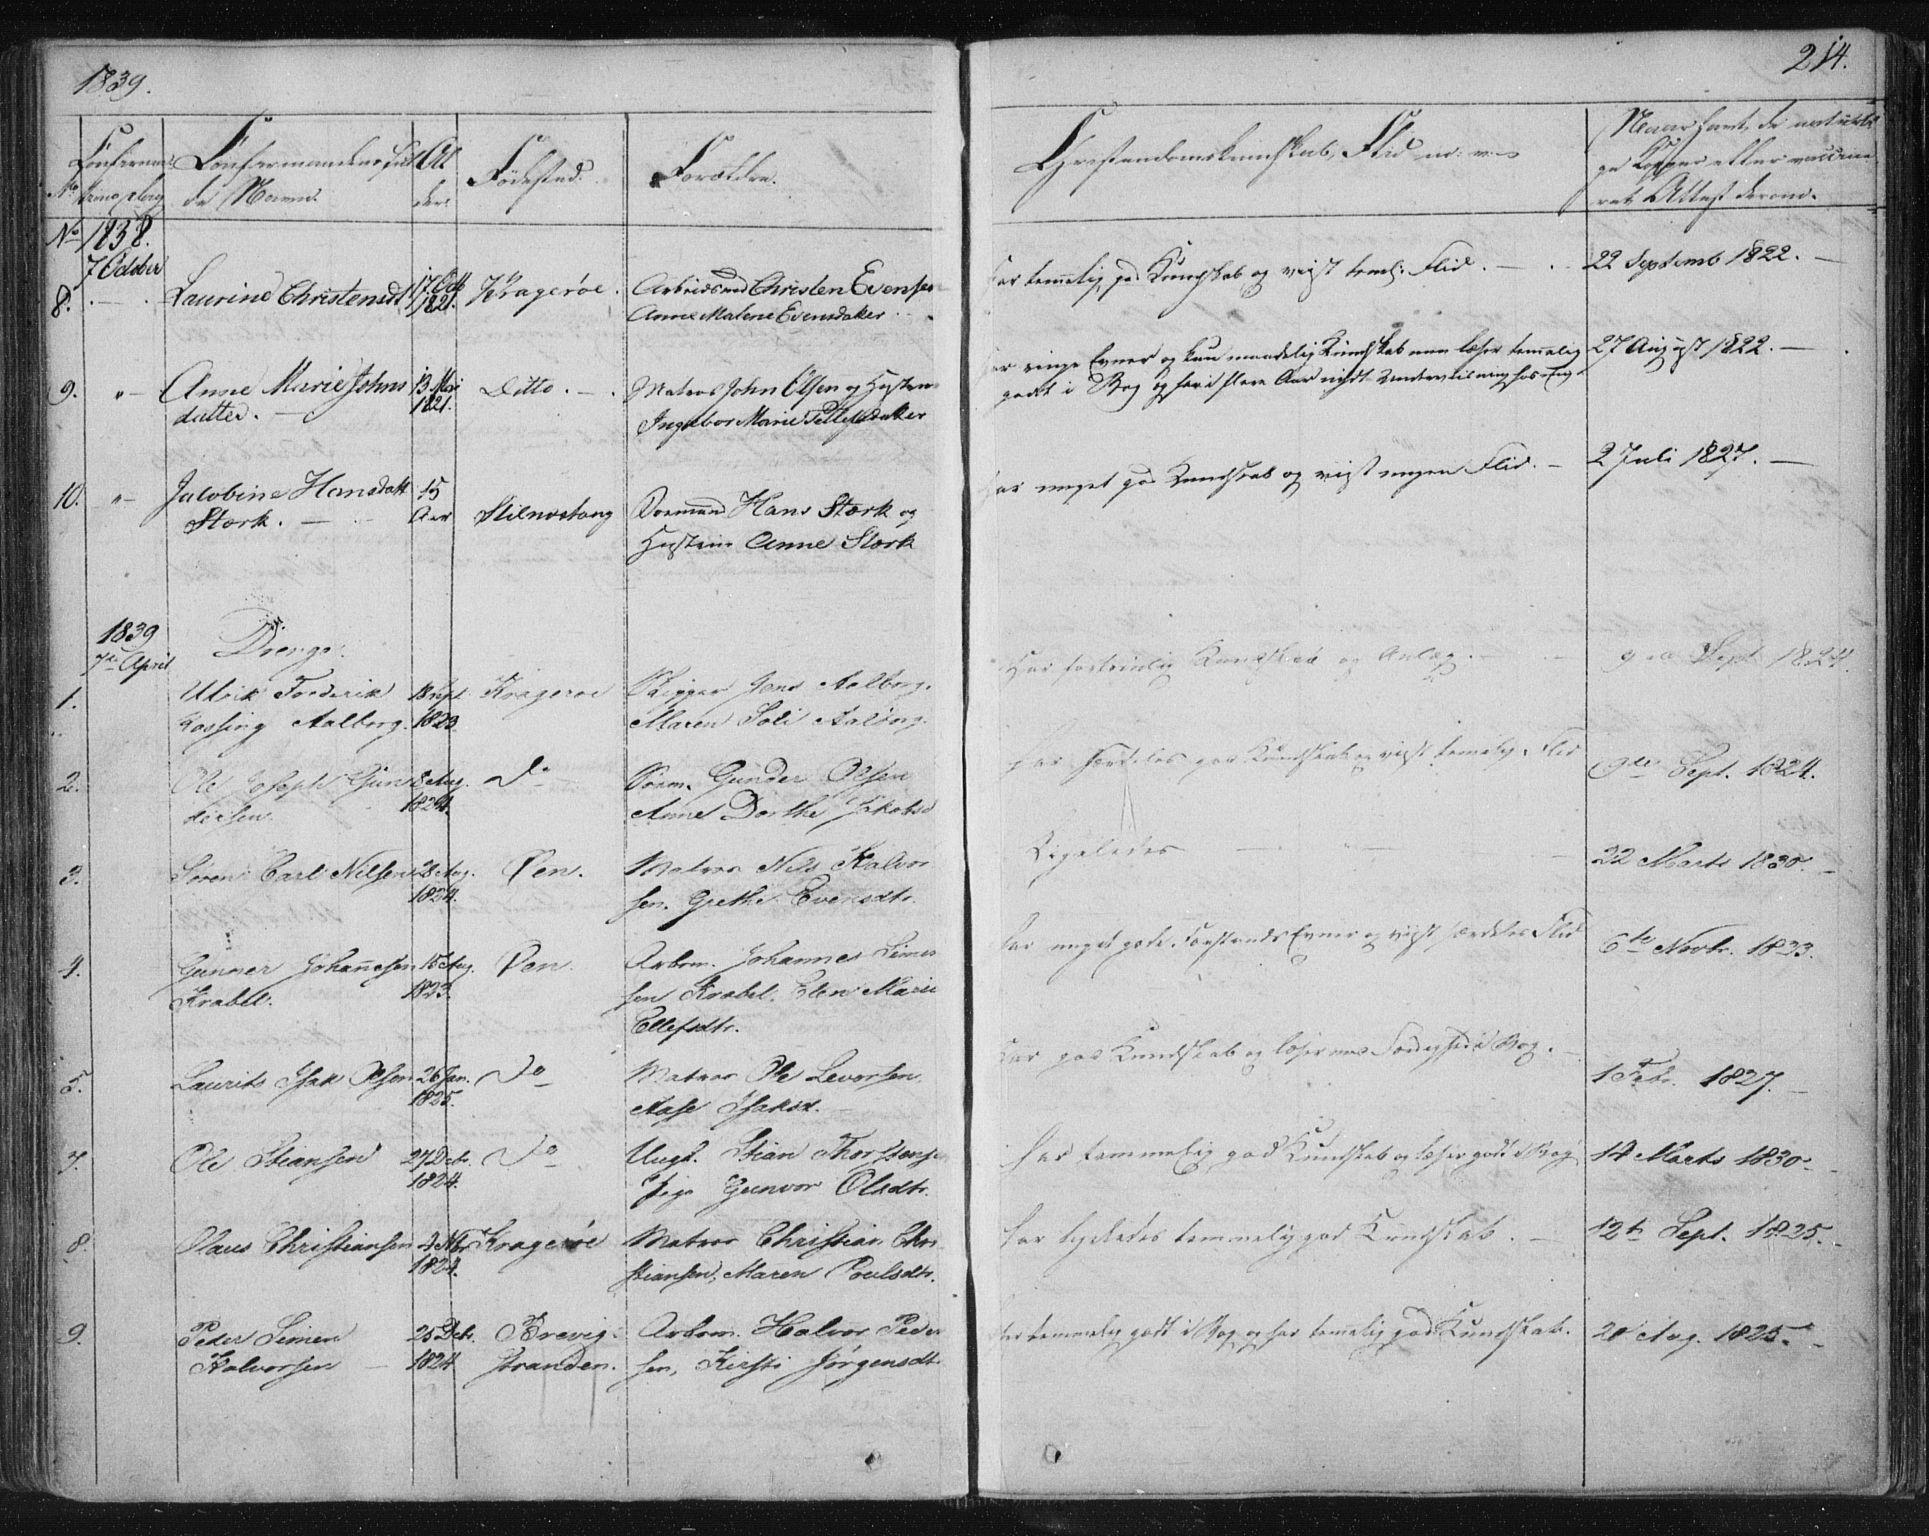 SAKO, Kragerø kirkebøker, F/Fa/L0005: Ministerialbok nr. 5, 1832-1847, s. 214